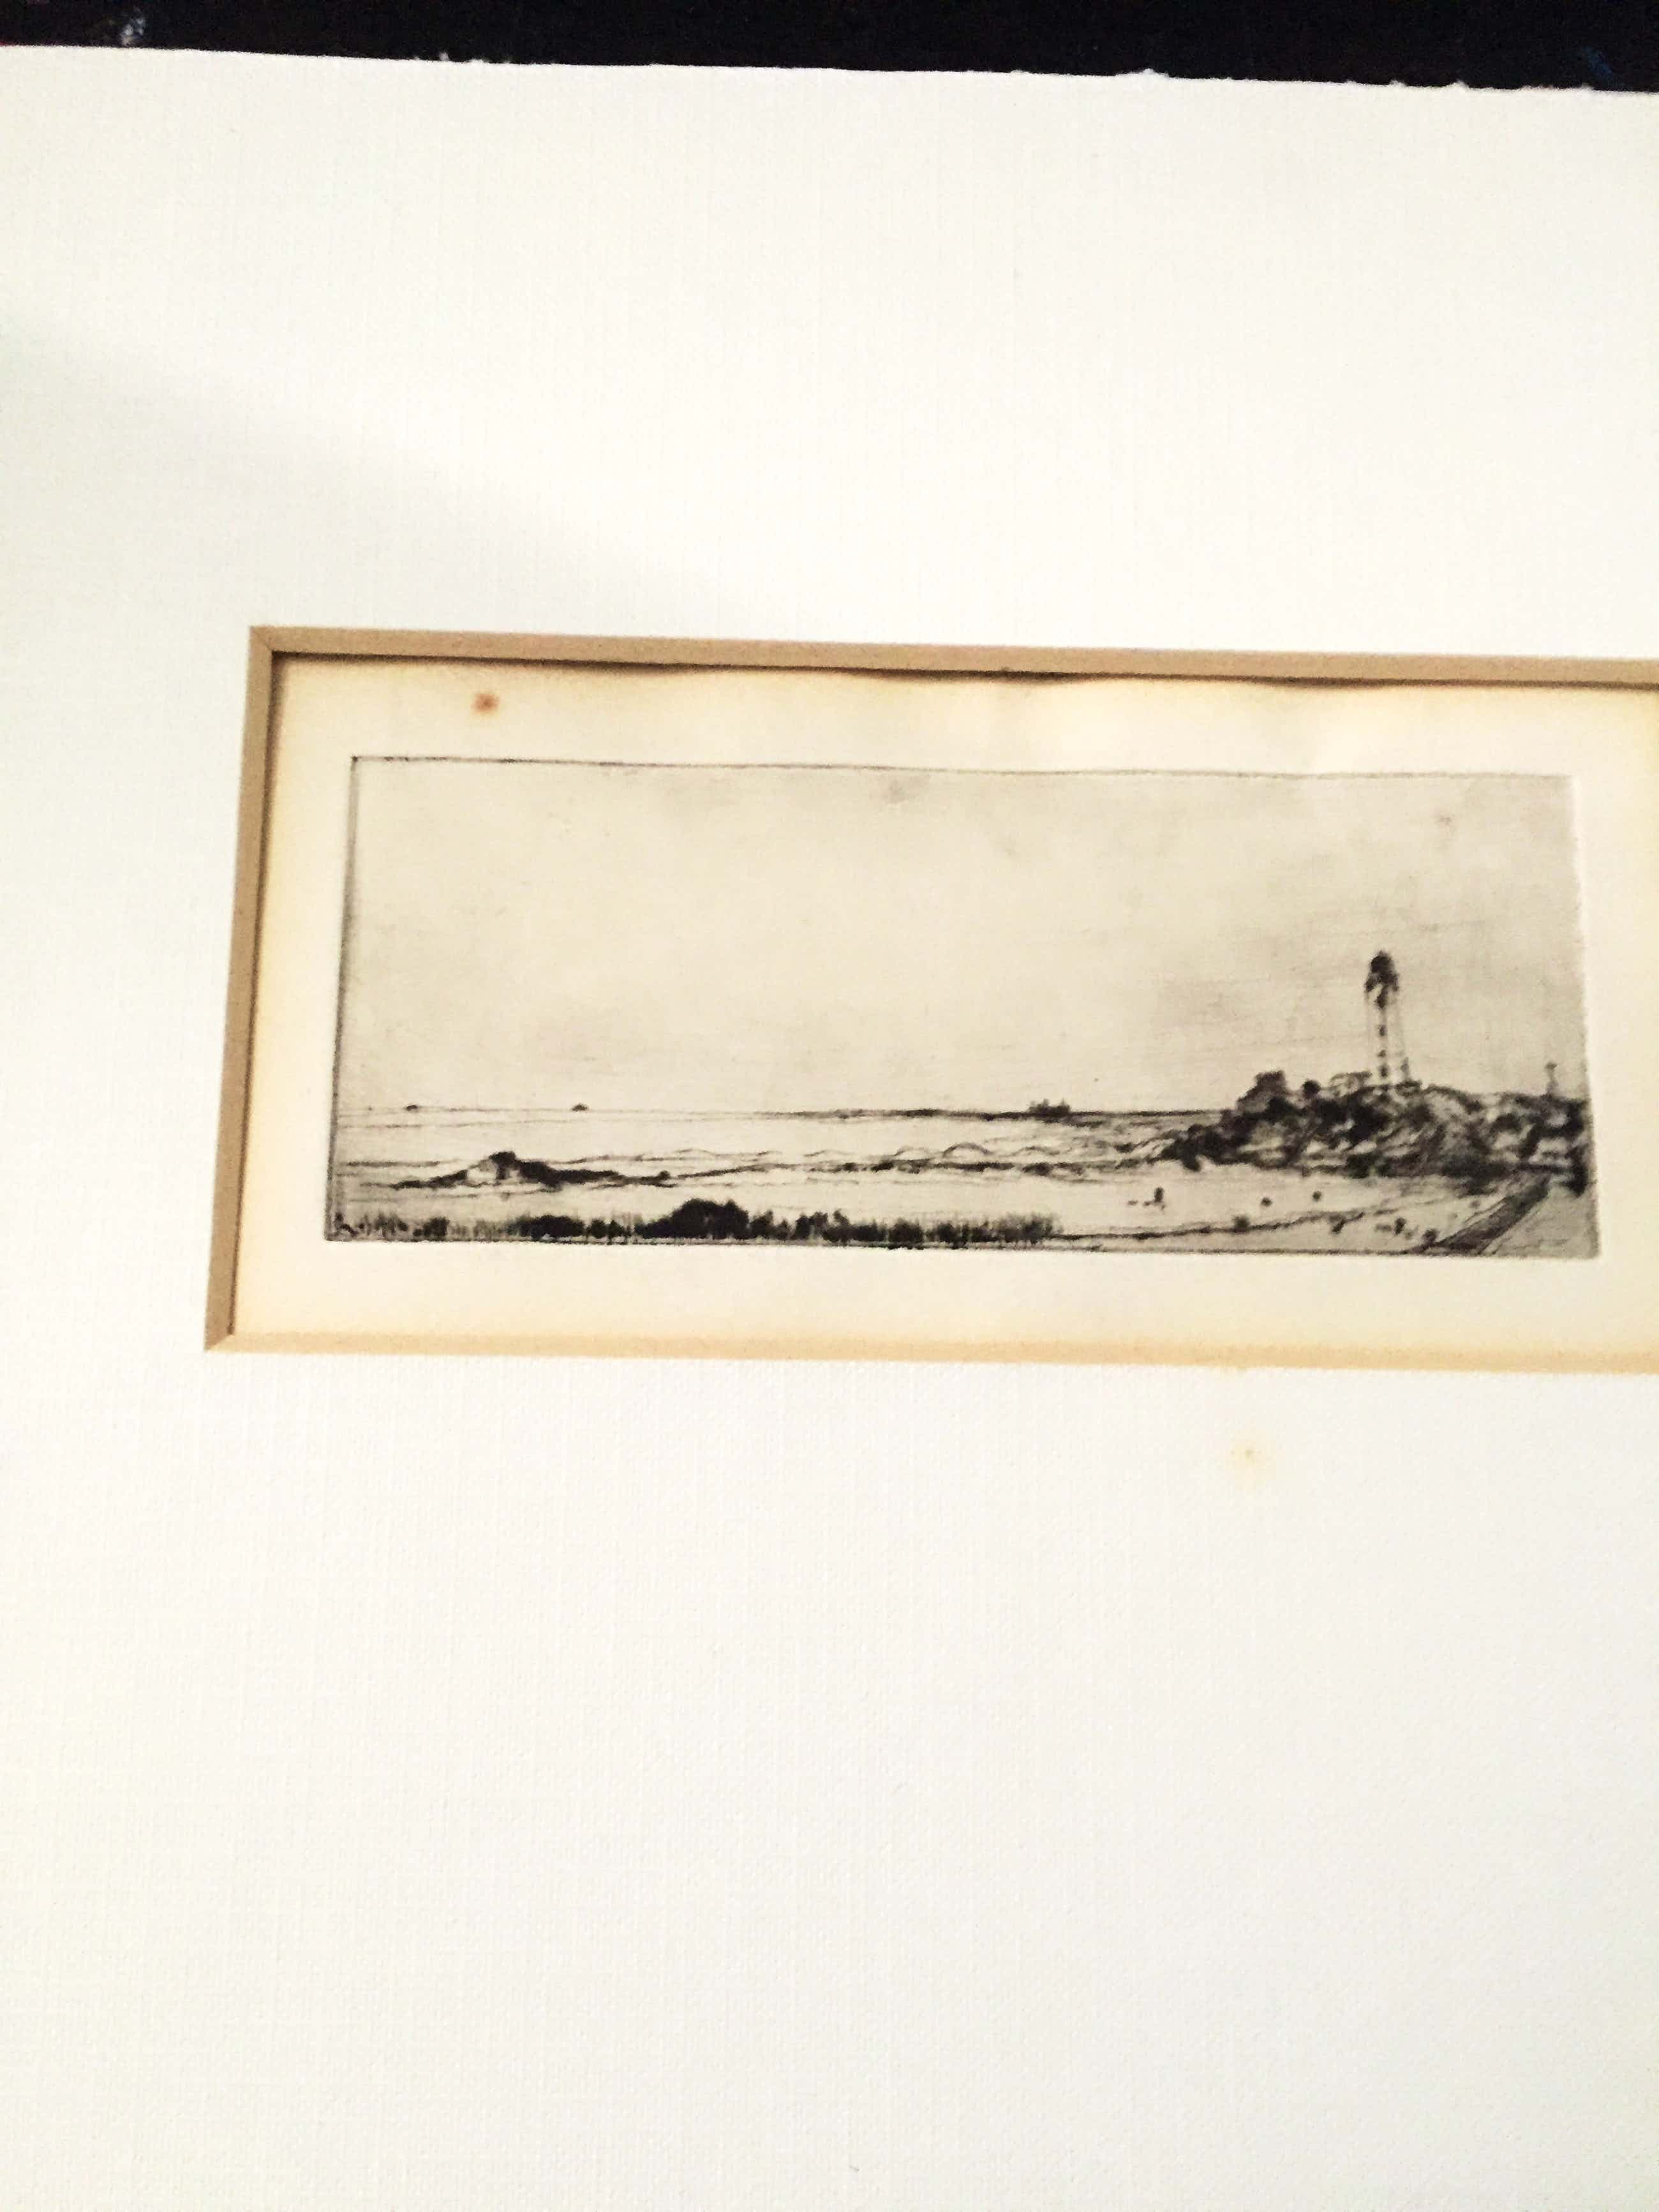 Frans Pannekoek - Cabo Trafalgar kopen? Bied vanaf 250!